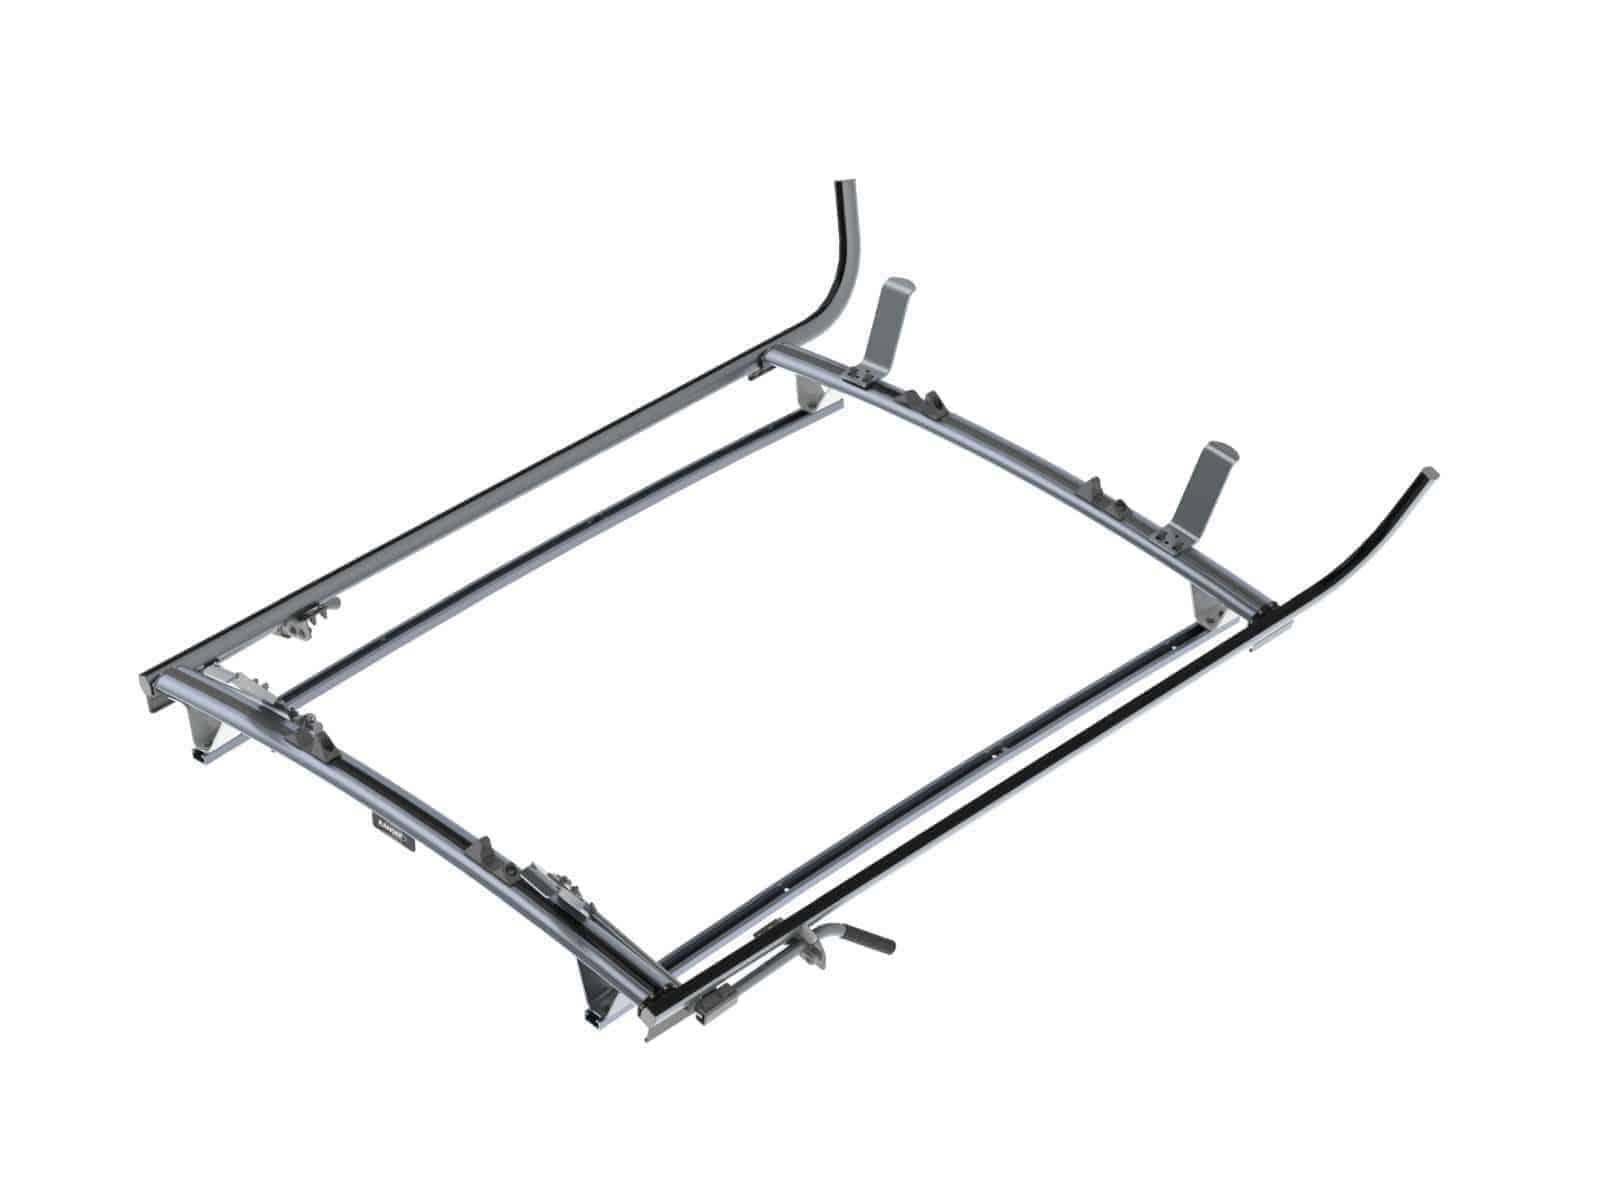 Double Clamp Ladder Rack Aluminum 2 Bar Nissan Nv200